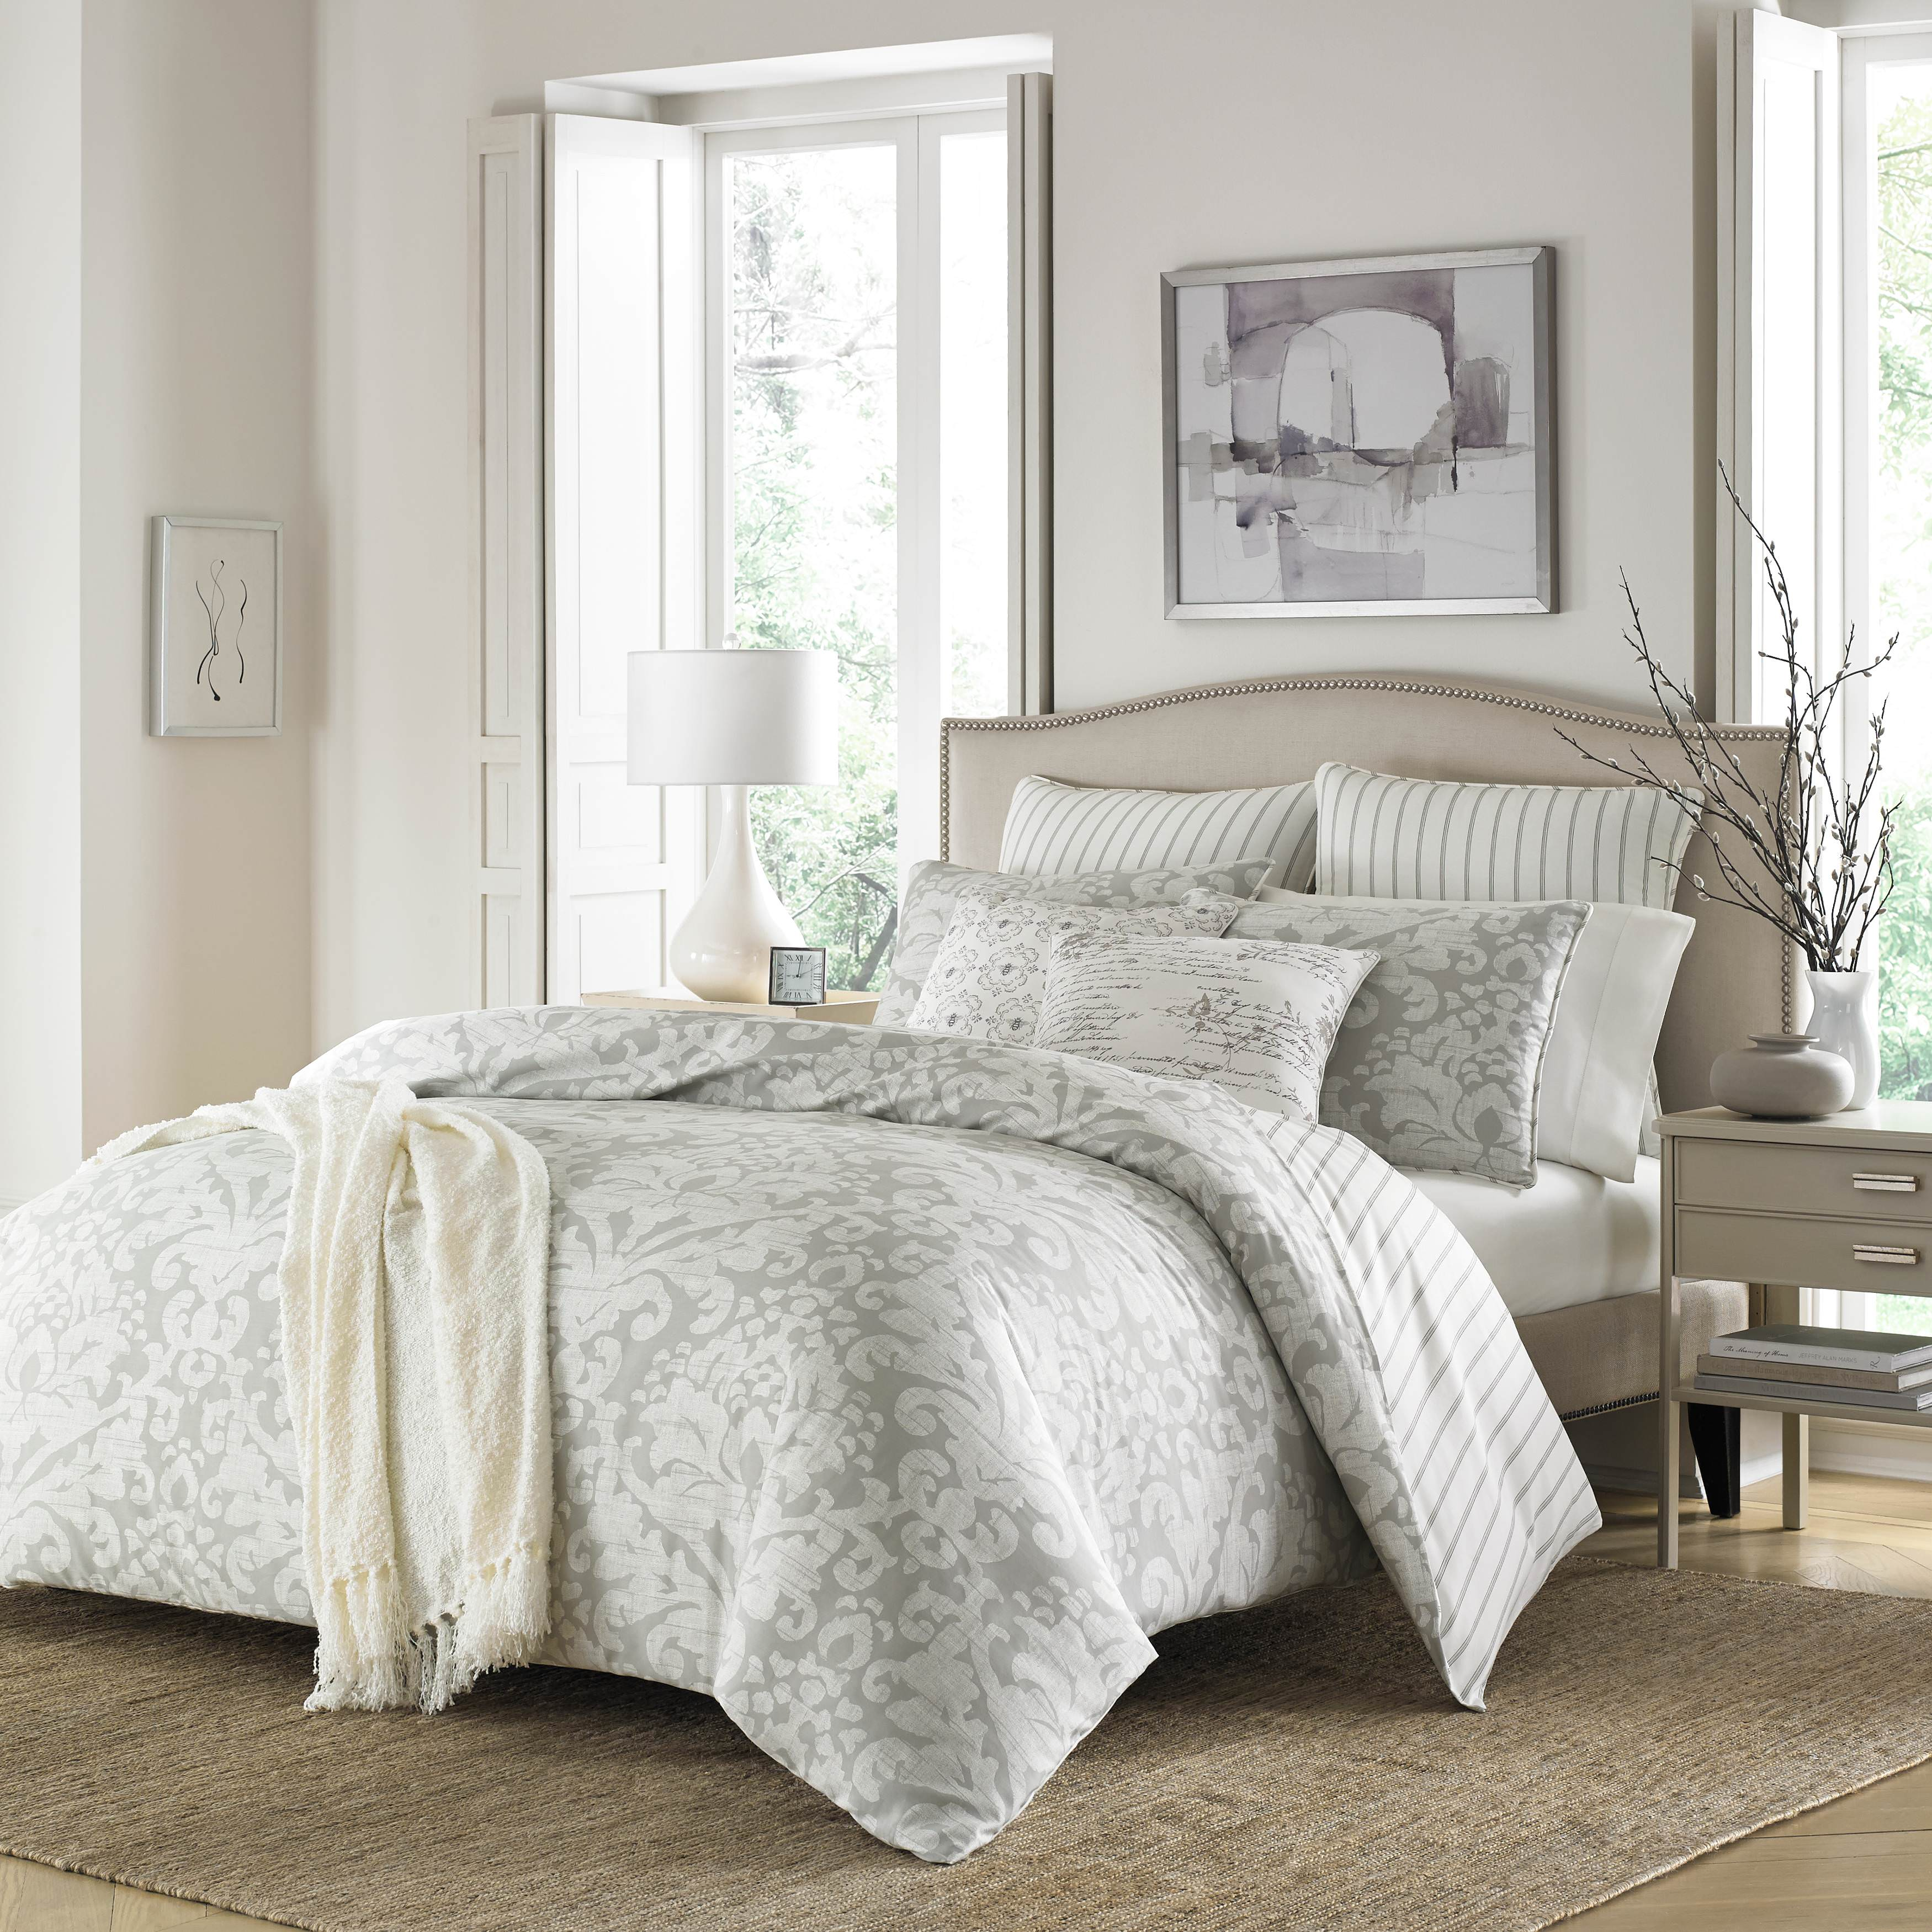 BEAUTIFUL XXXL ULTRA SOFT PLUSH WHITE CHENILLE VINTAGE LARGE BEDSPREAD QUILT SET